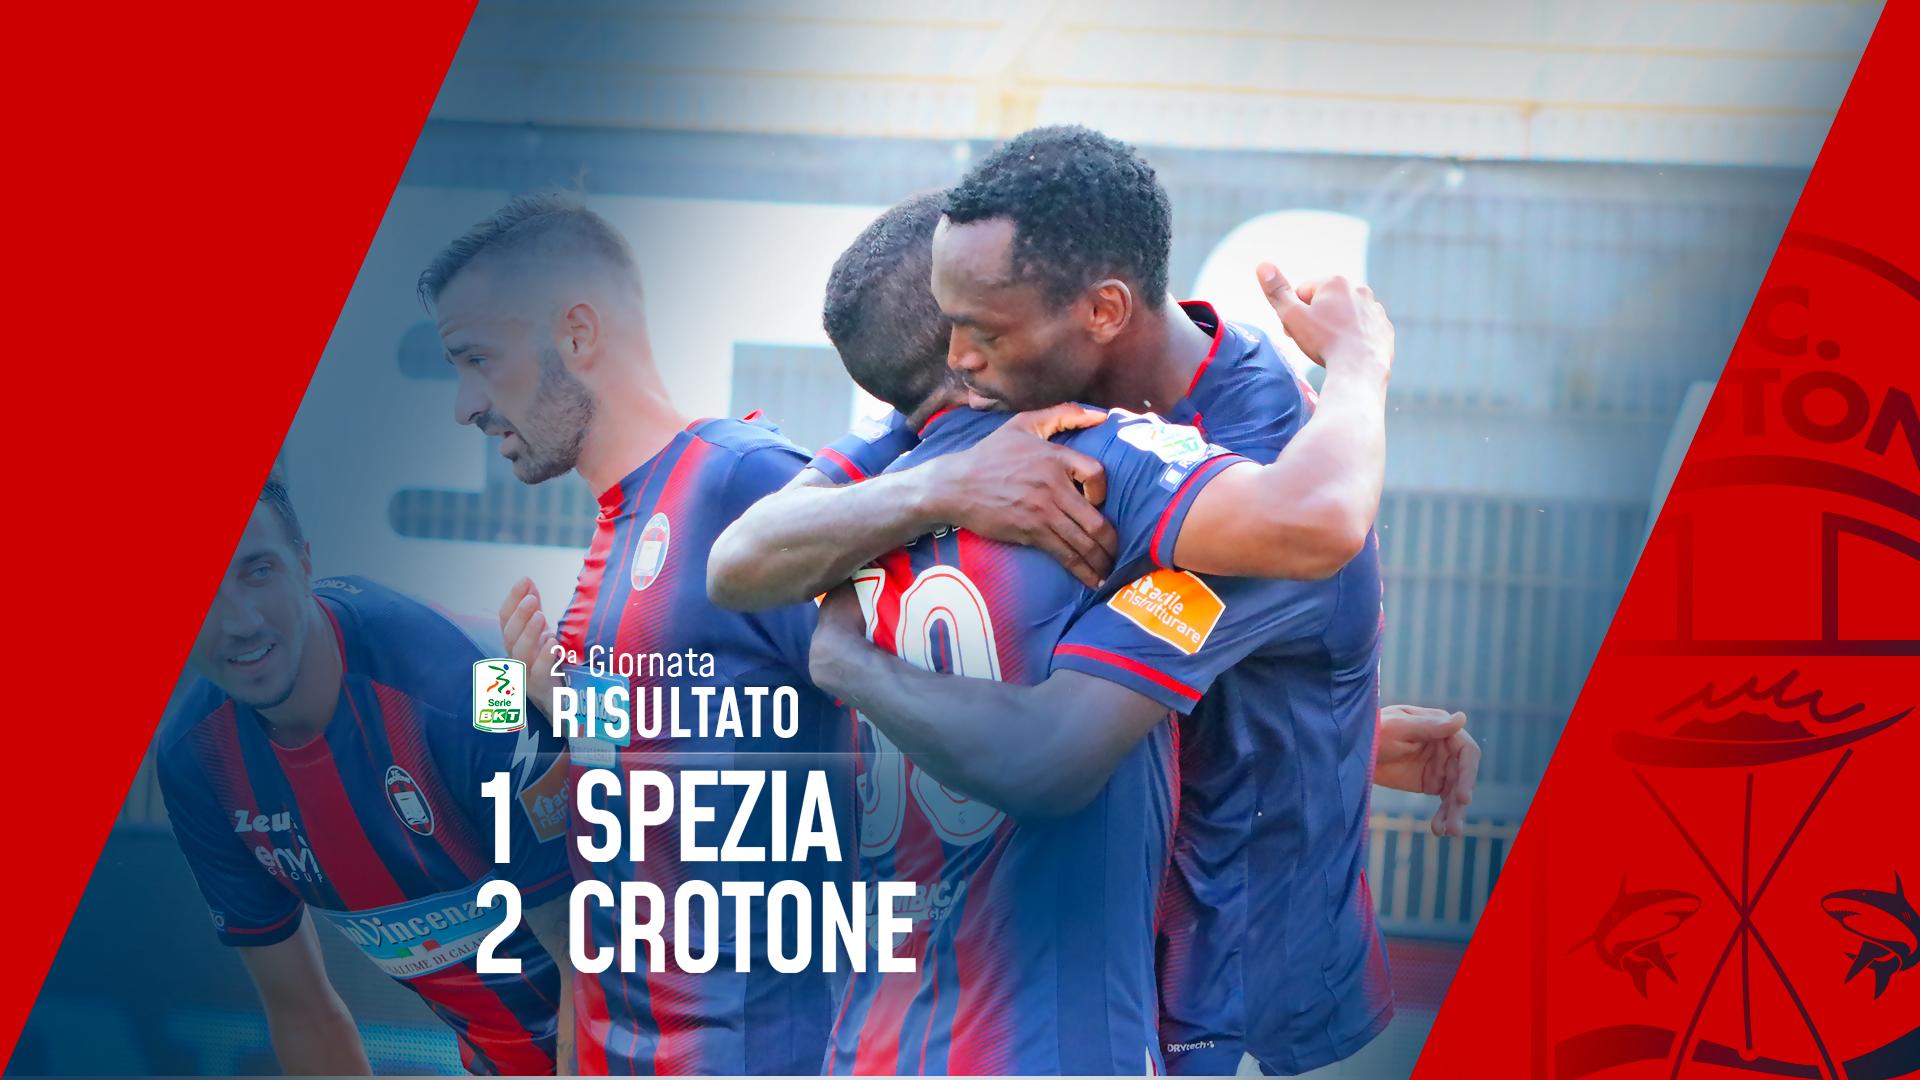 Serie BKT, 2a giornata: Spezia-Crotone 1-2